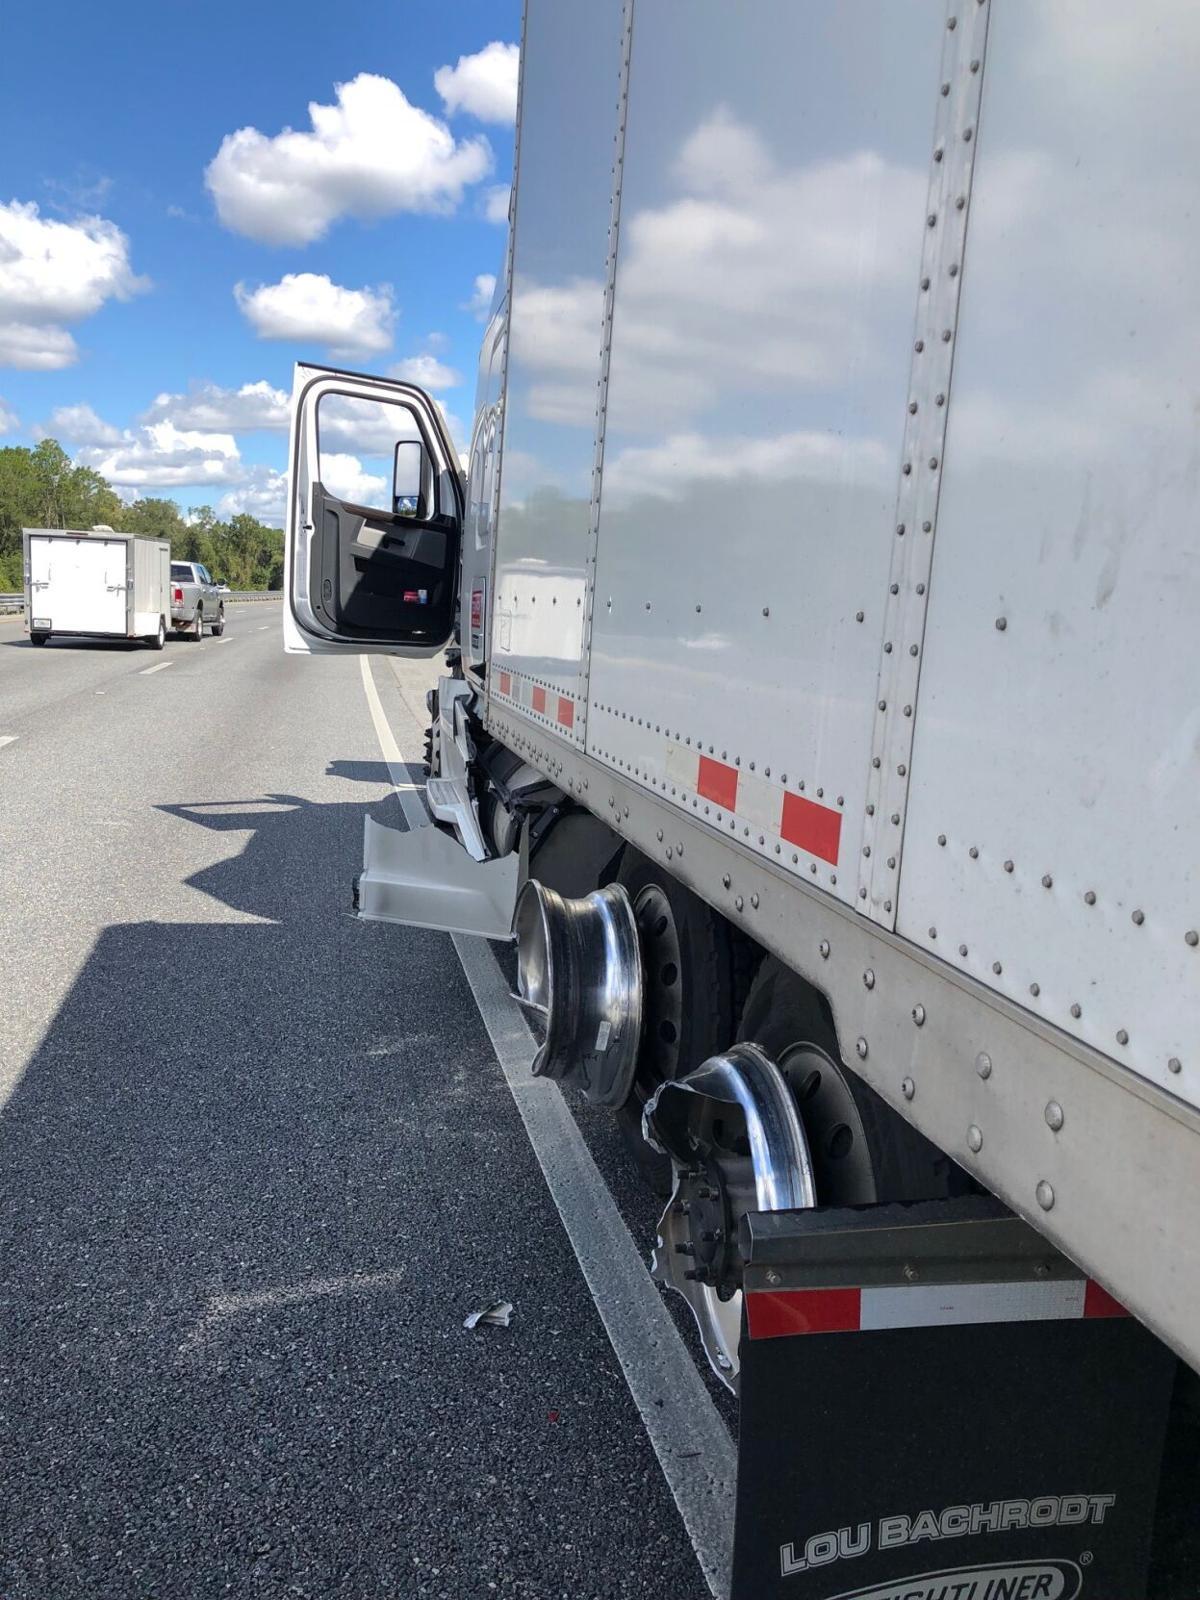 Largo man, passenger injured after tire blowout on I-75